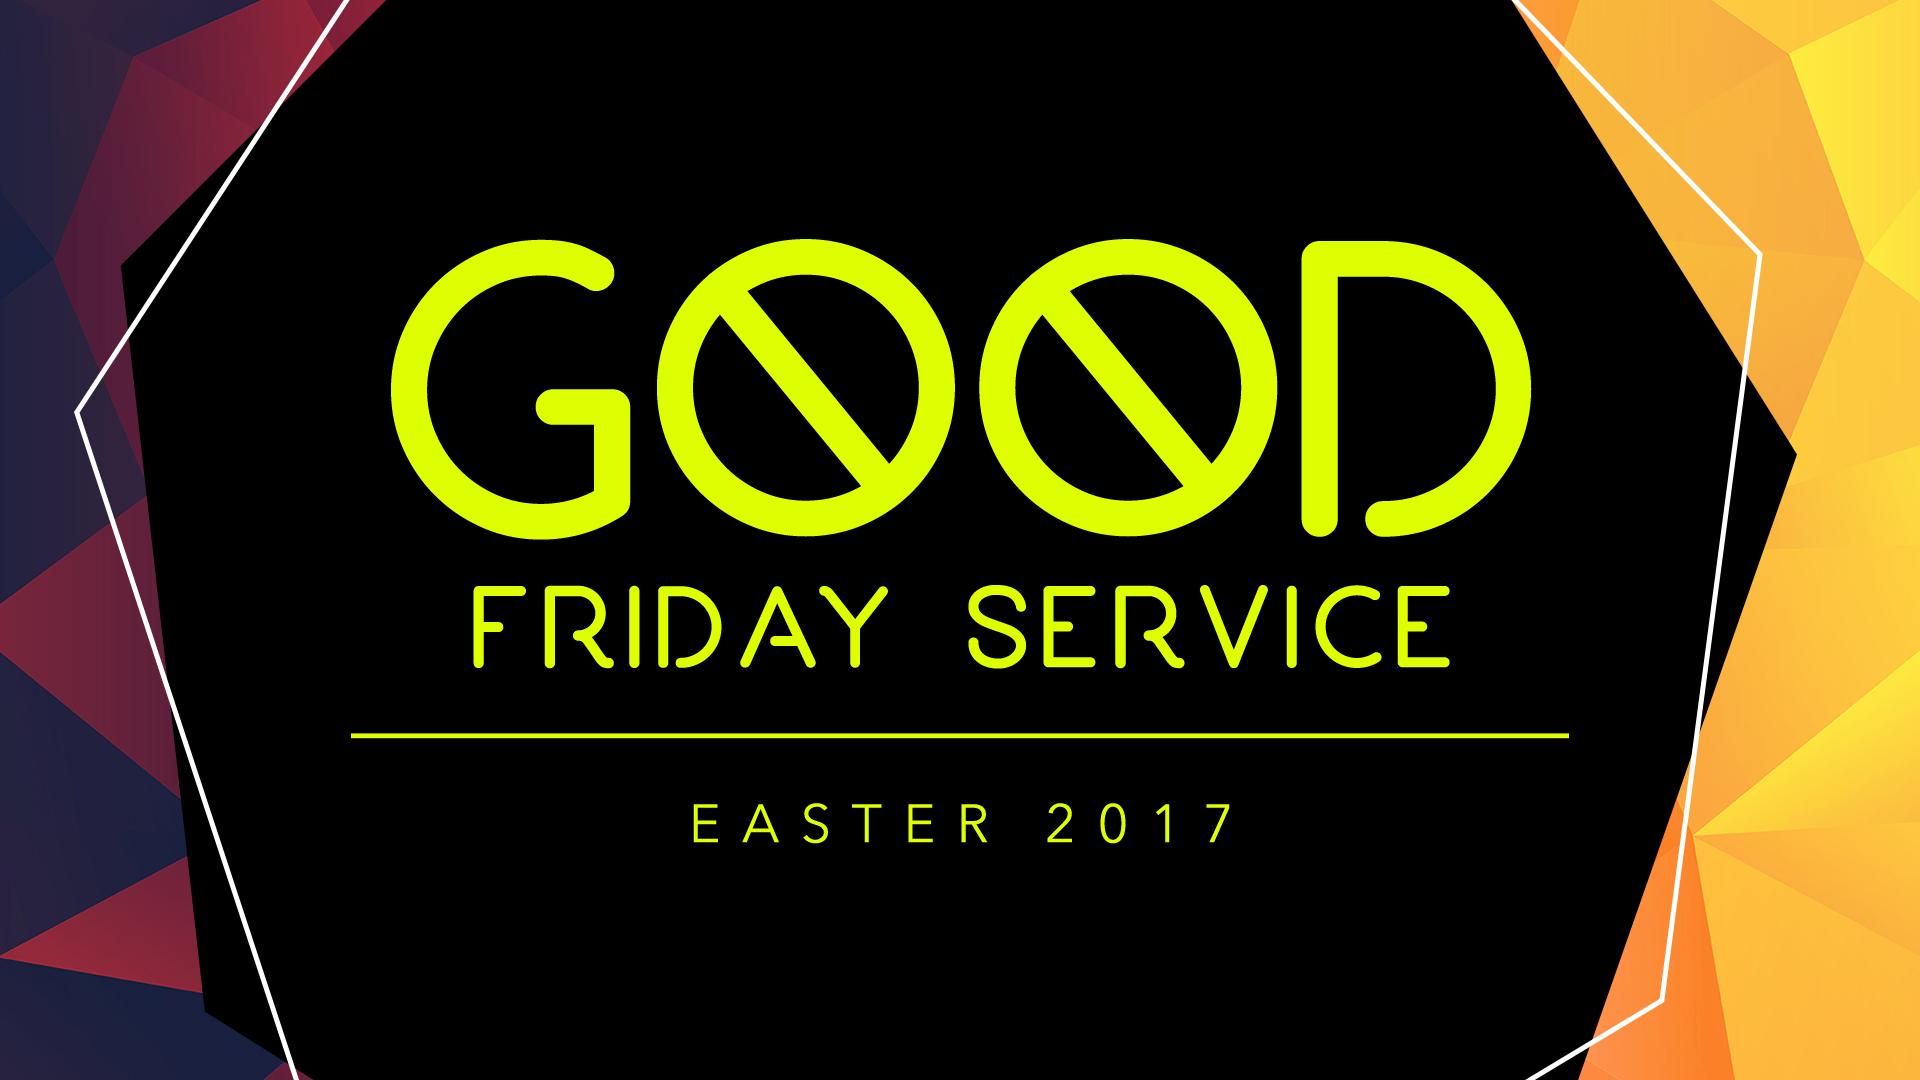 Good Friday Service Graphics